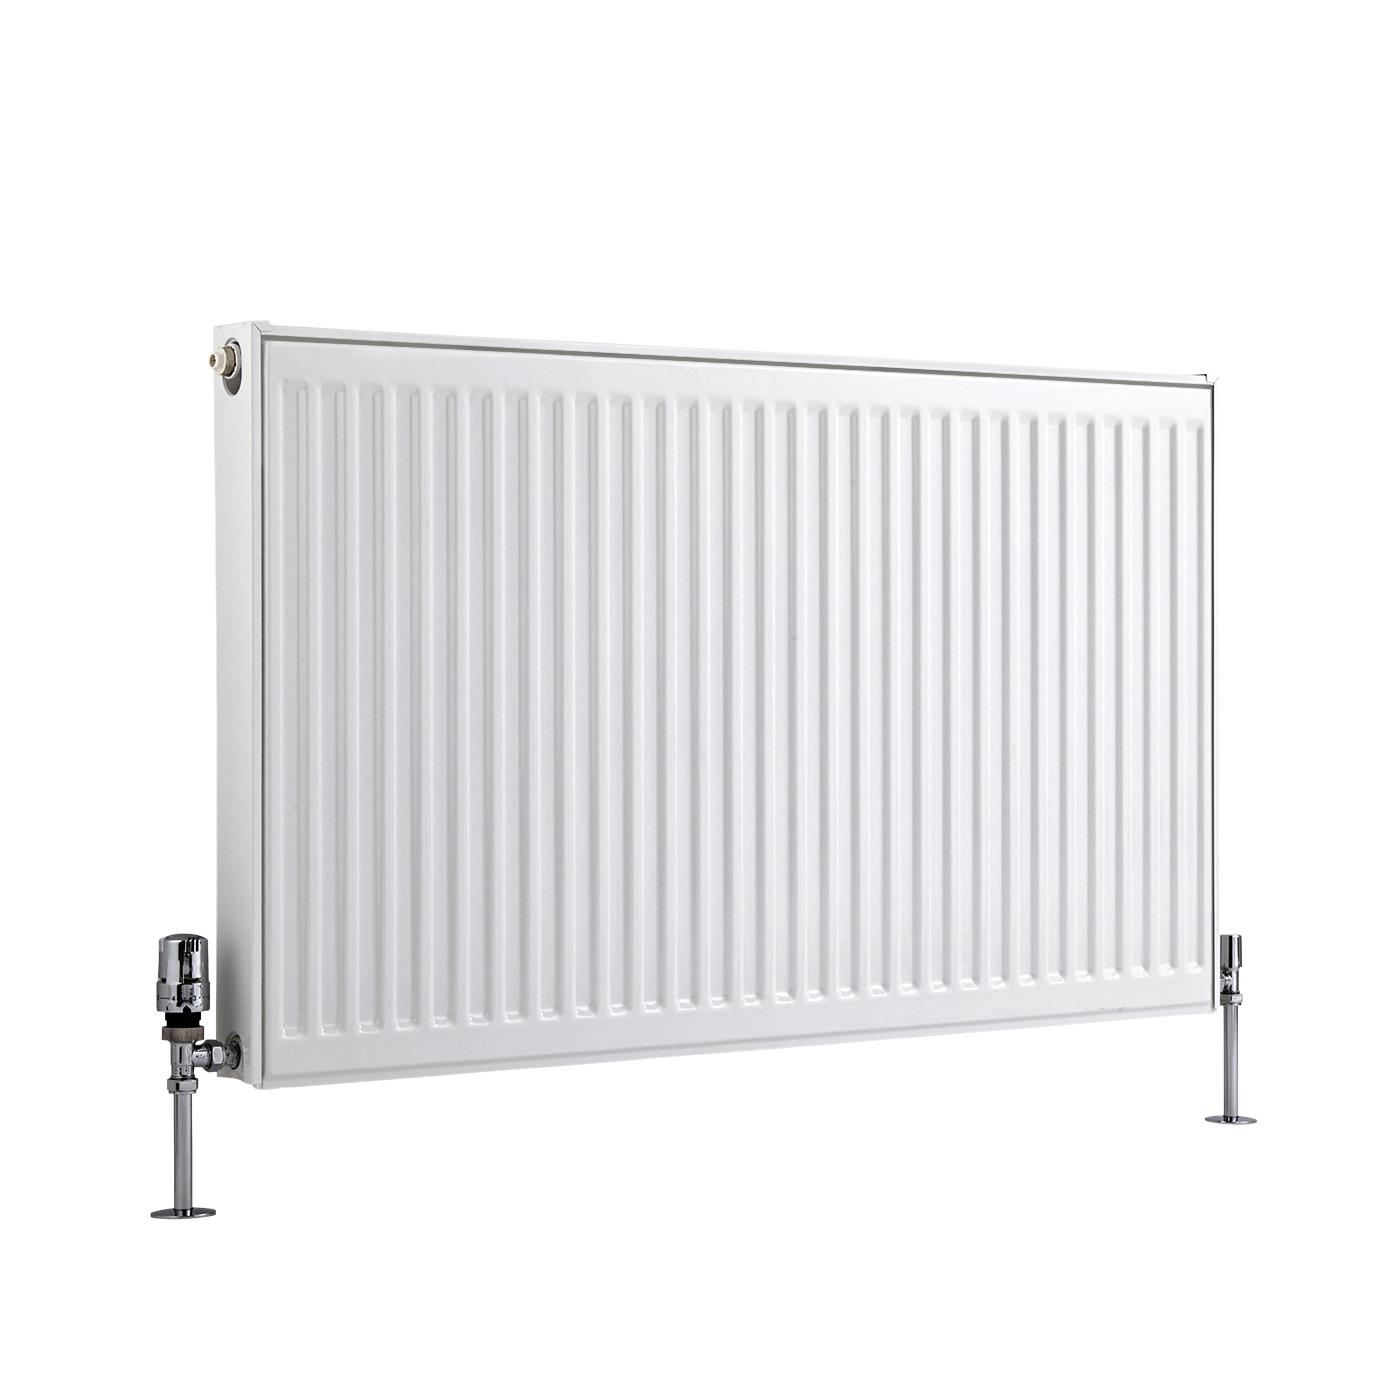 Radiateur À Panneaux Type 11 Horizontal Blanc Eco 60cm x 100cm x 5cm 926 Watts